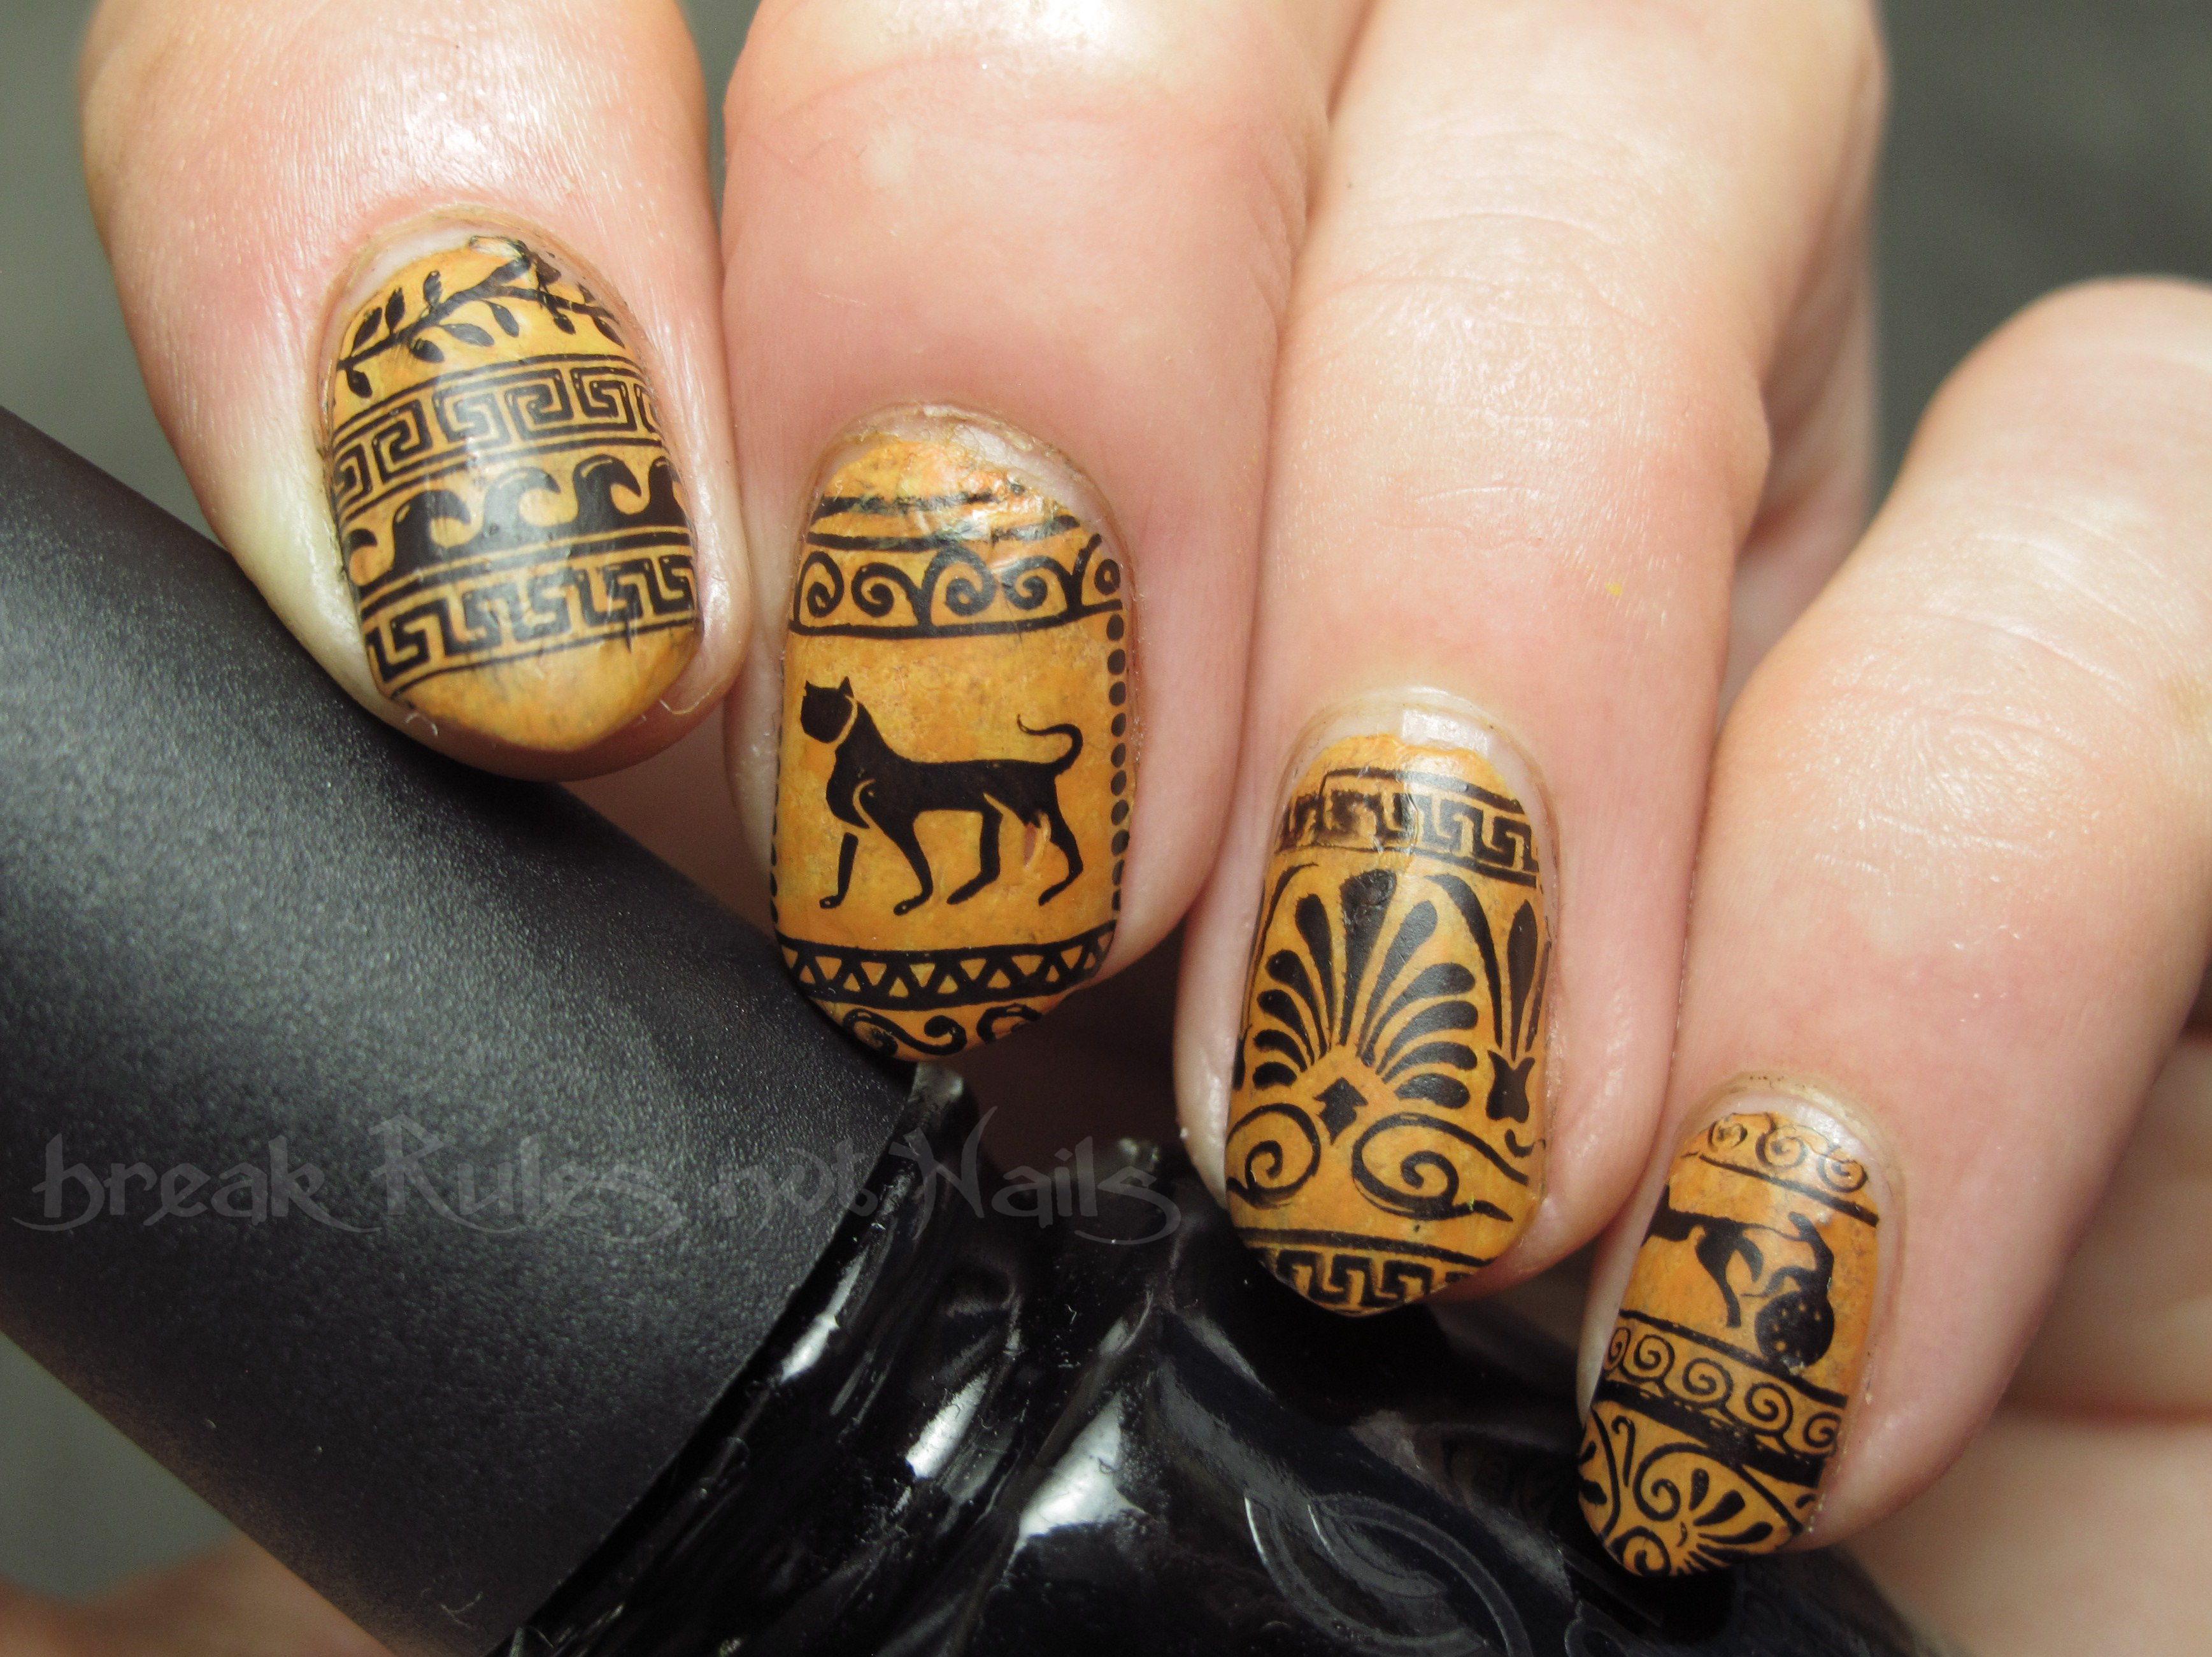 Ancient greek nail art | Break rules, not nails